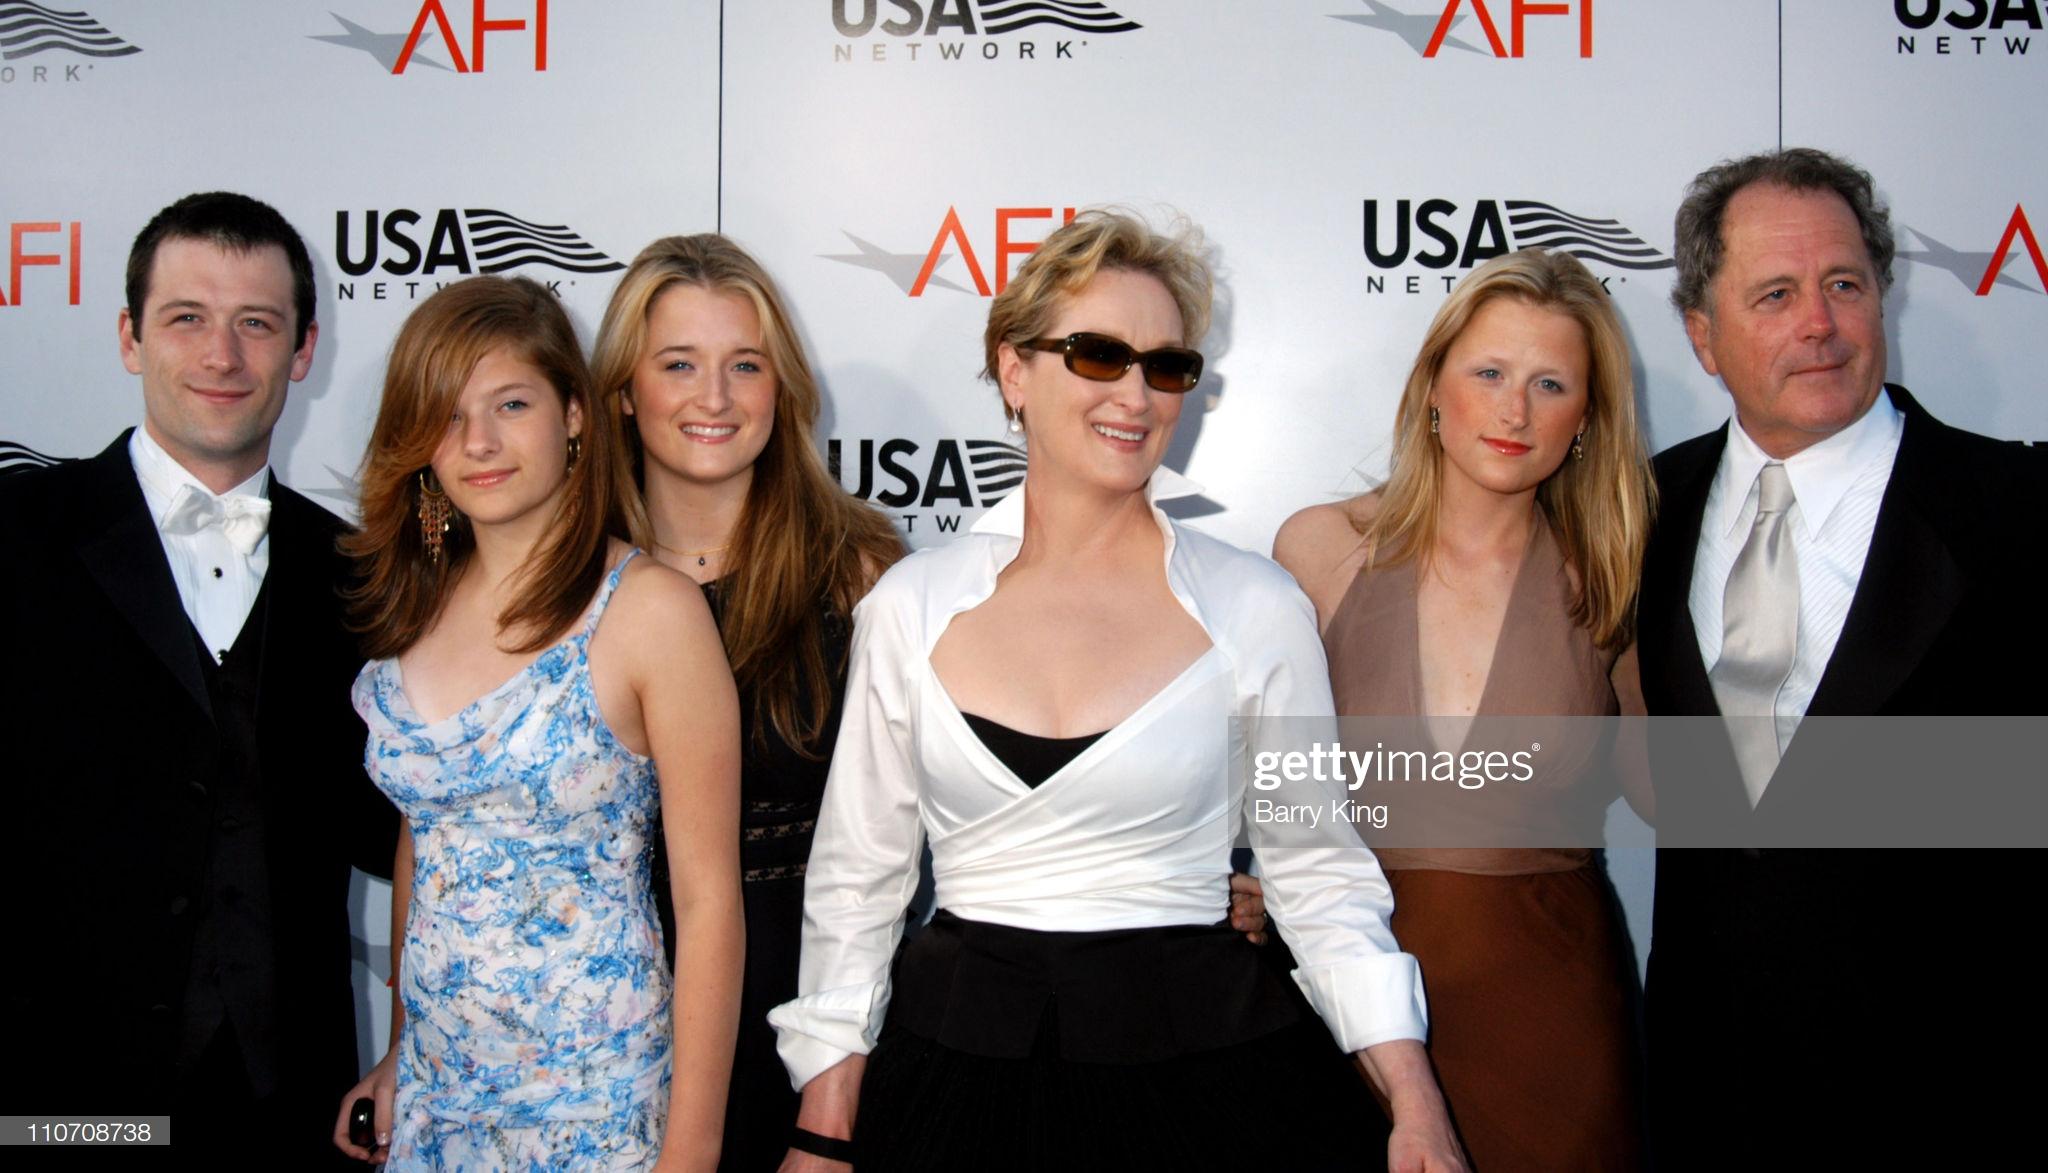 USA Network Presents 2004 AFI Lifetime Achievement Award - A Tribute to Meryl Streep - Arrivals : Fotografía de noticias